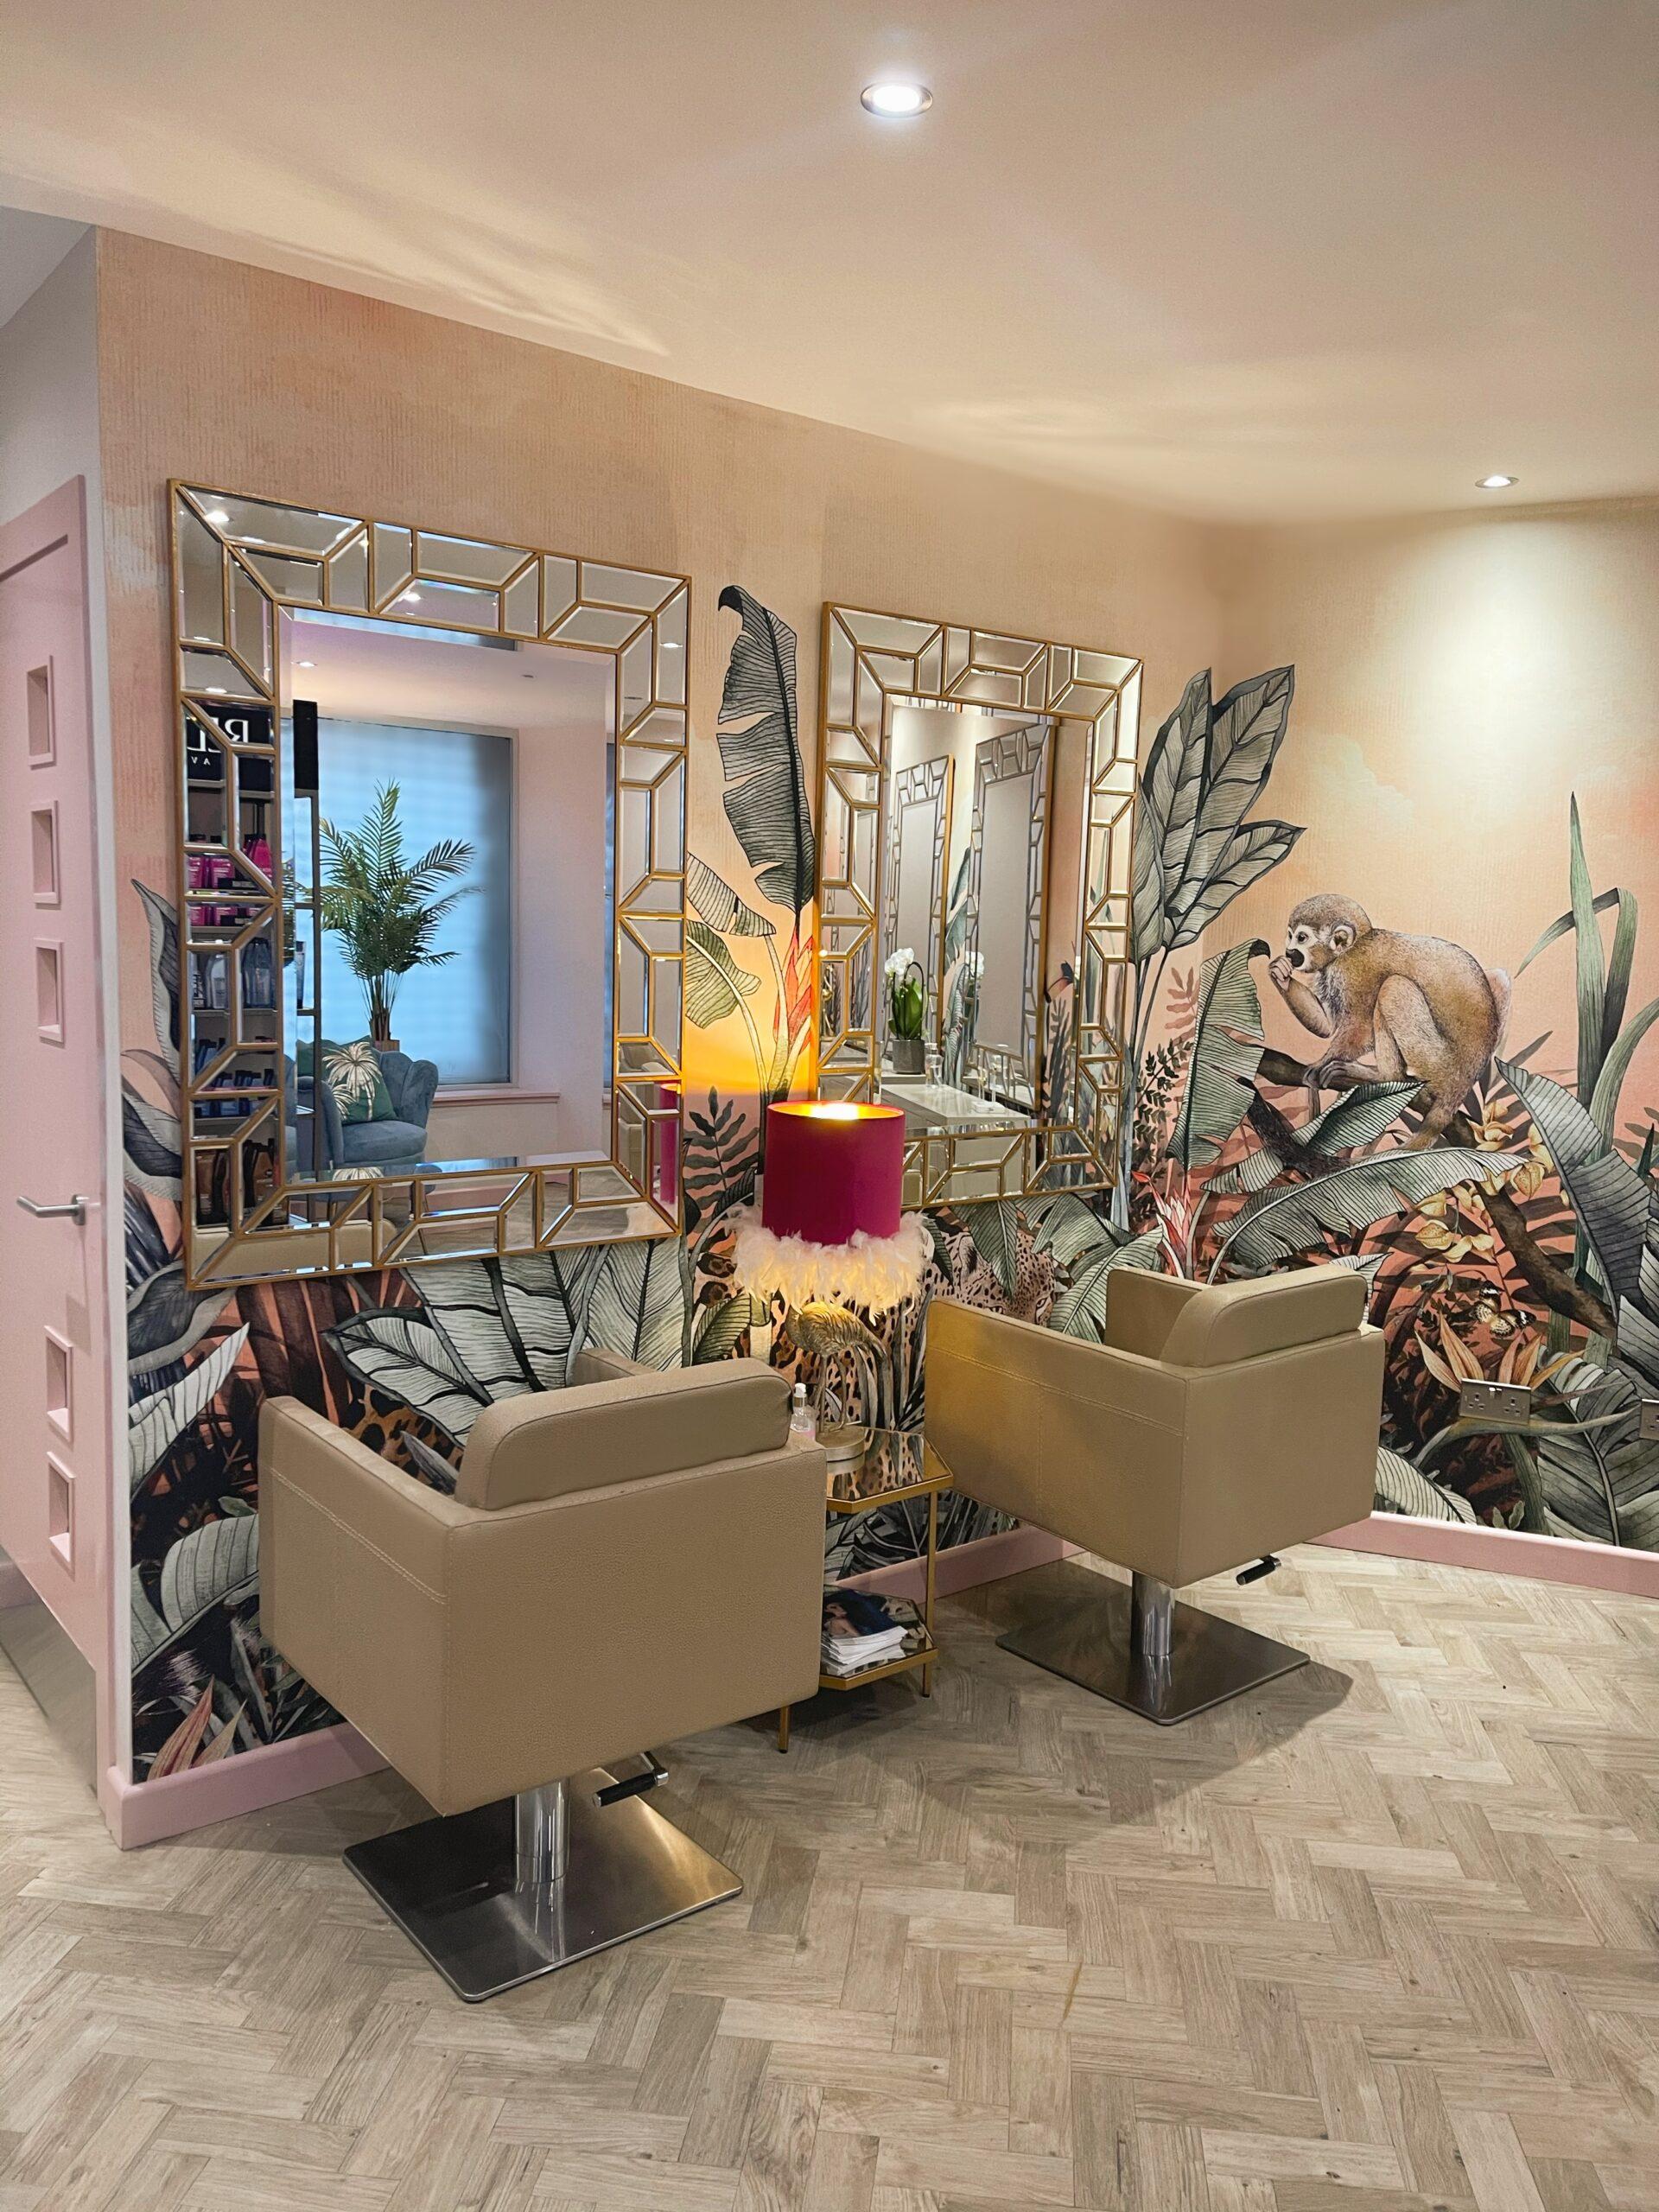 Wild Salon in Dundee has an absolutely stunning design